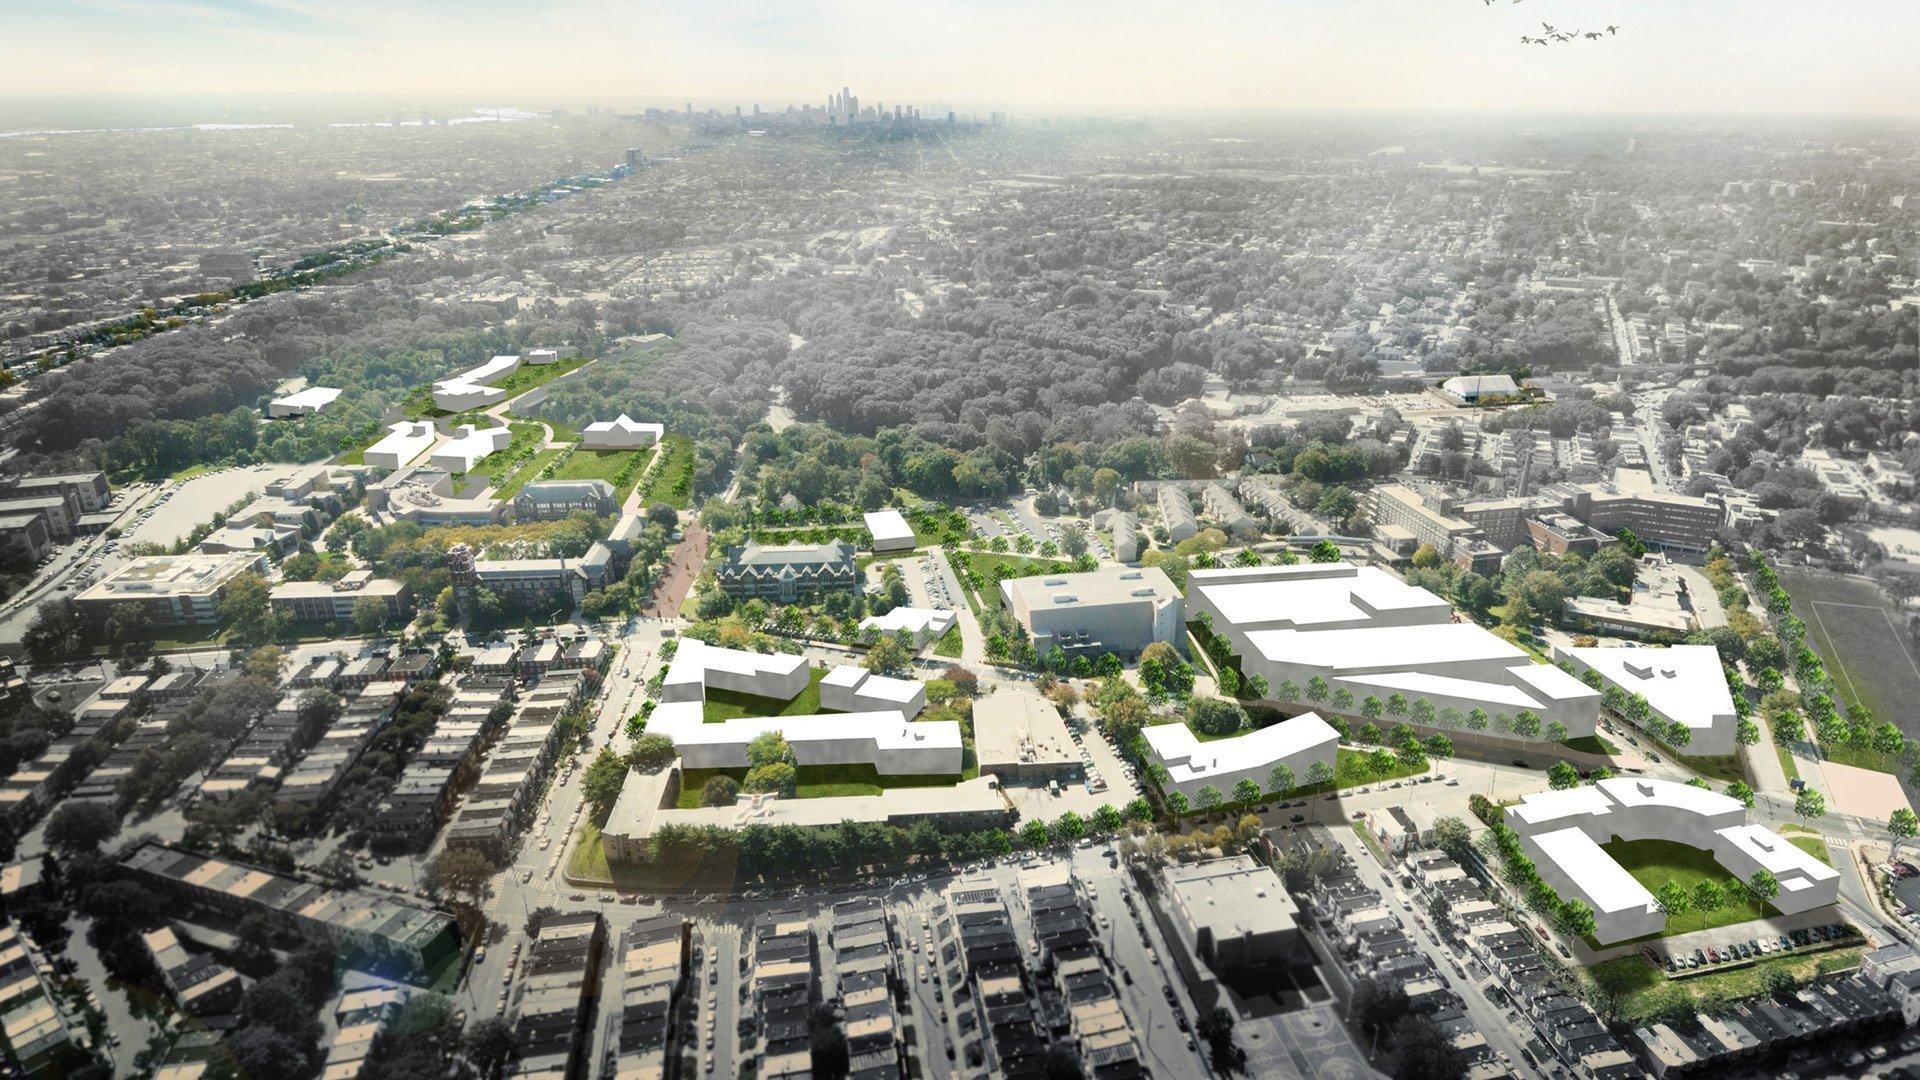 Photos De La Salle lasalle university strategic facilities plan - hord coplan macht